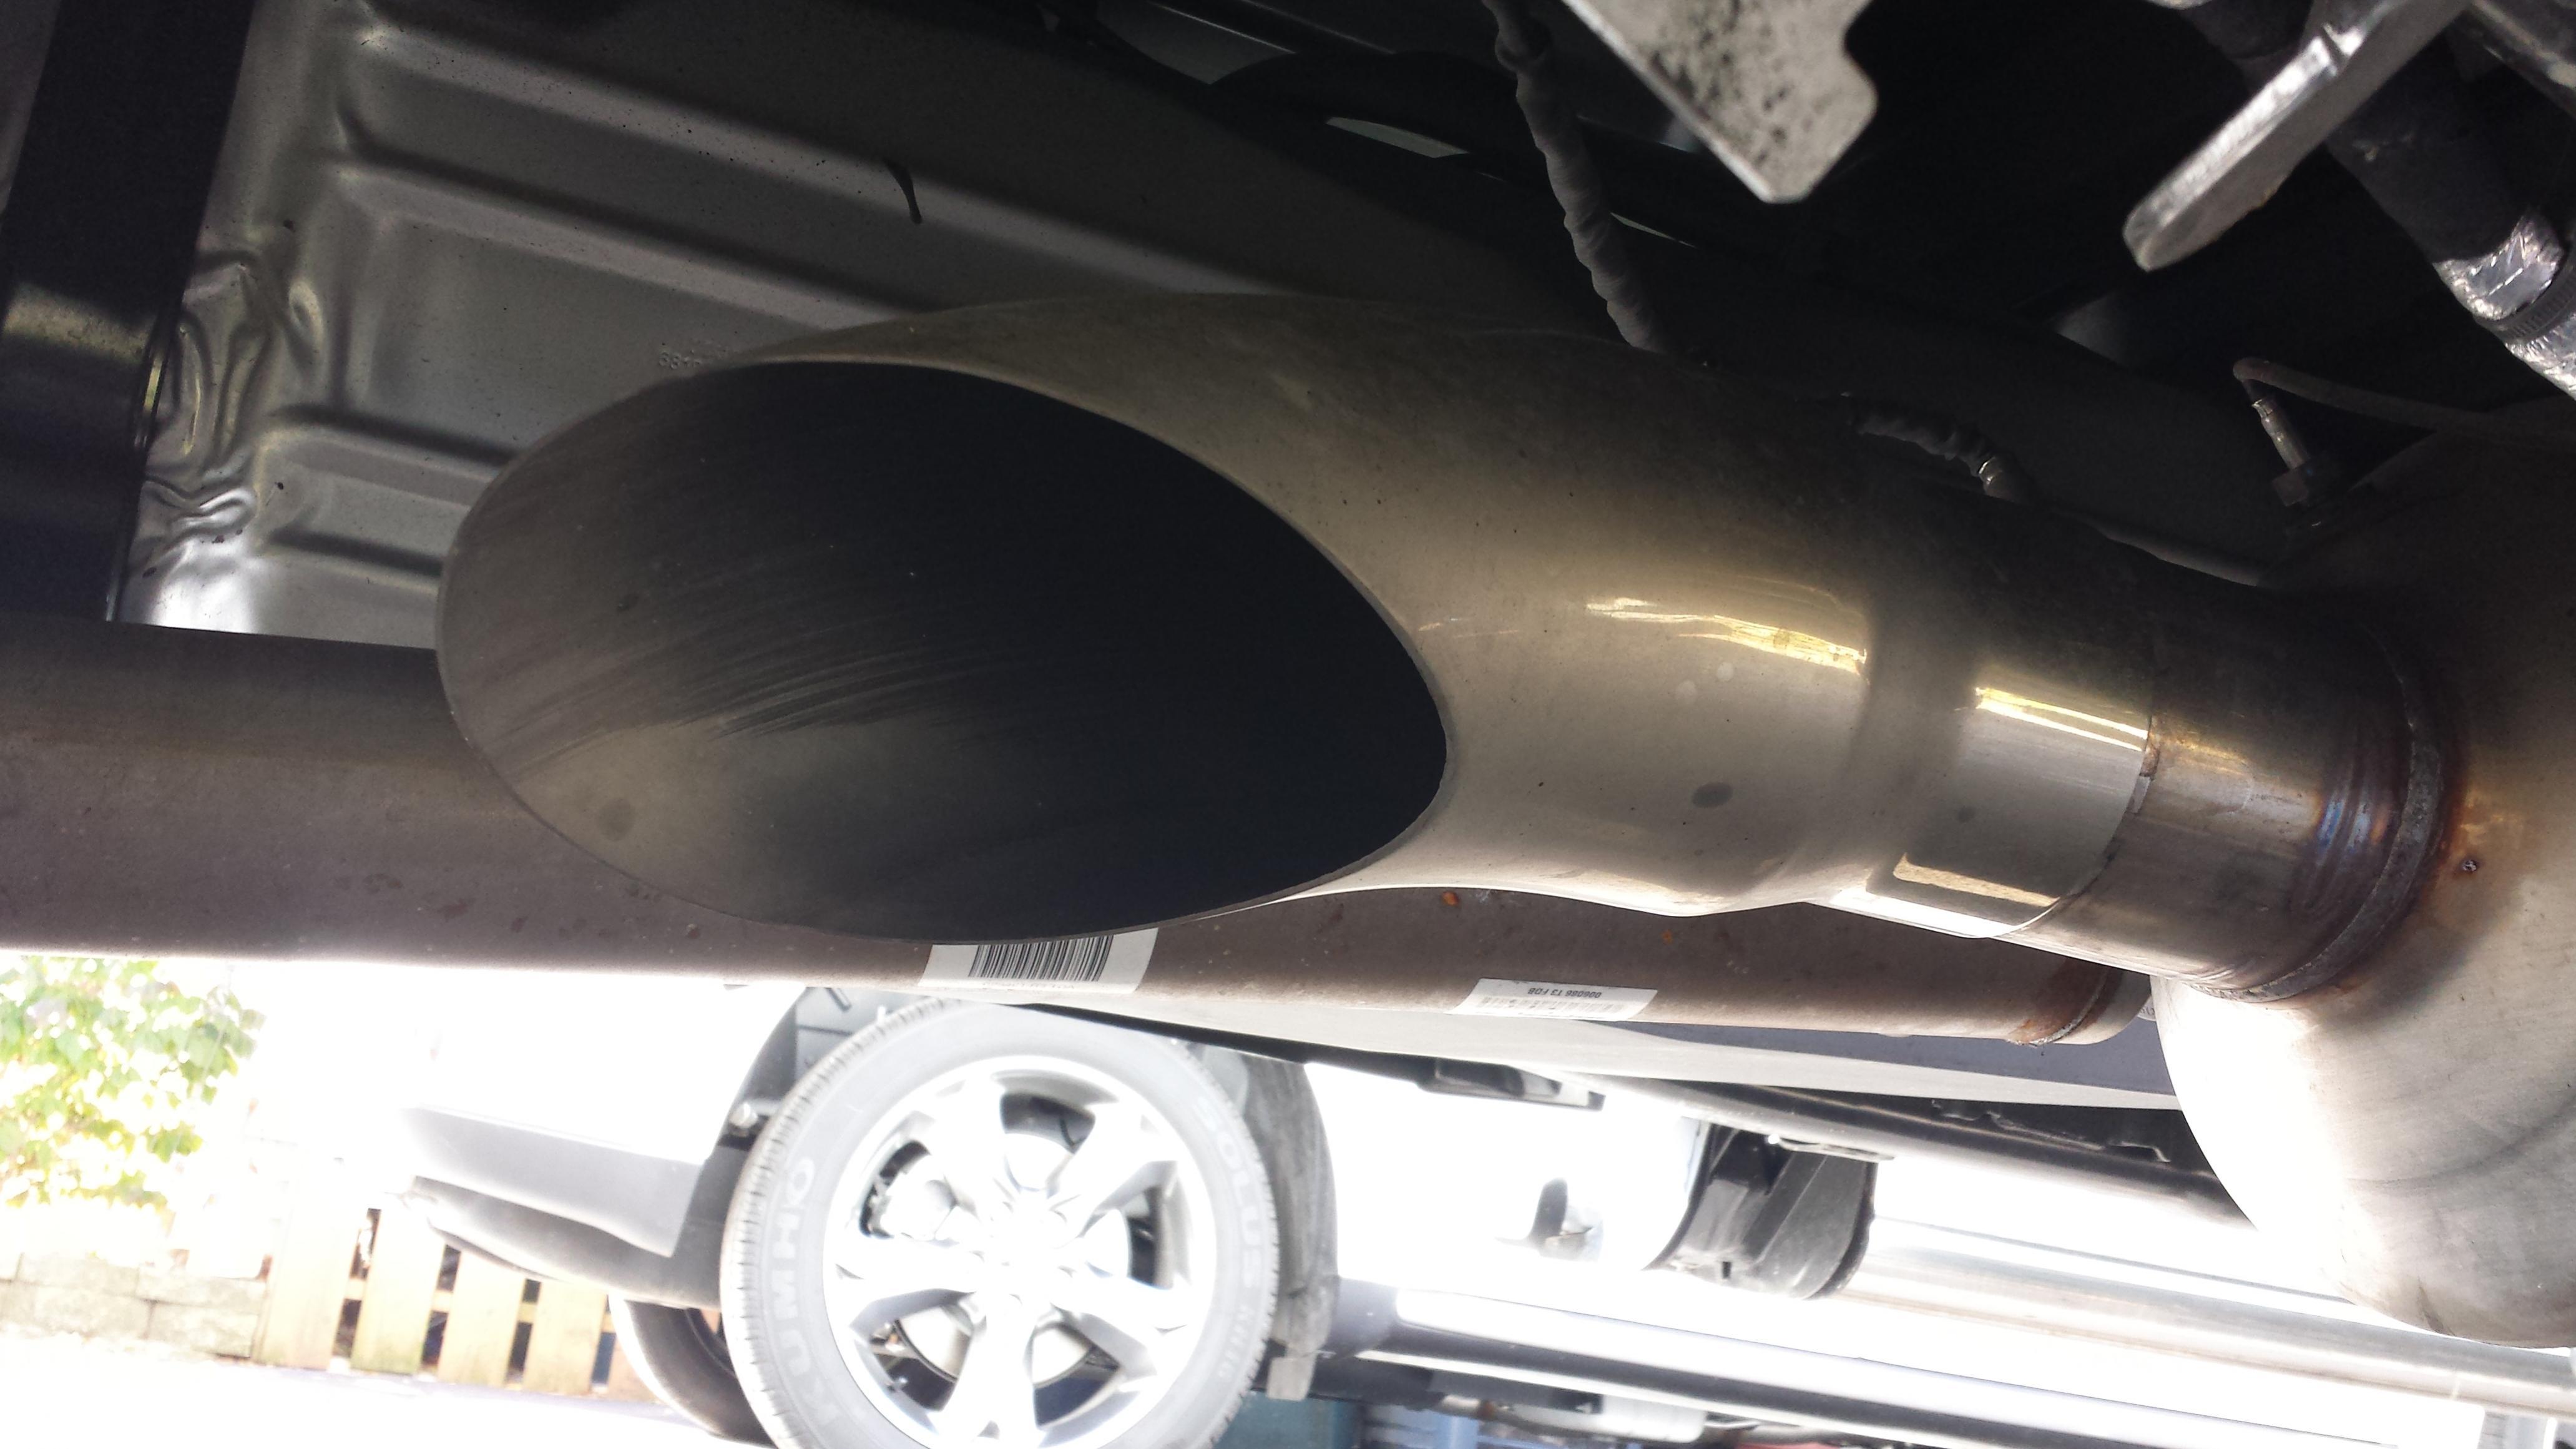 D Exhaust Tip Do You Prefer on 2013 Dodge Ram 2500 4x4